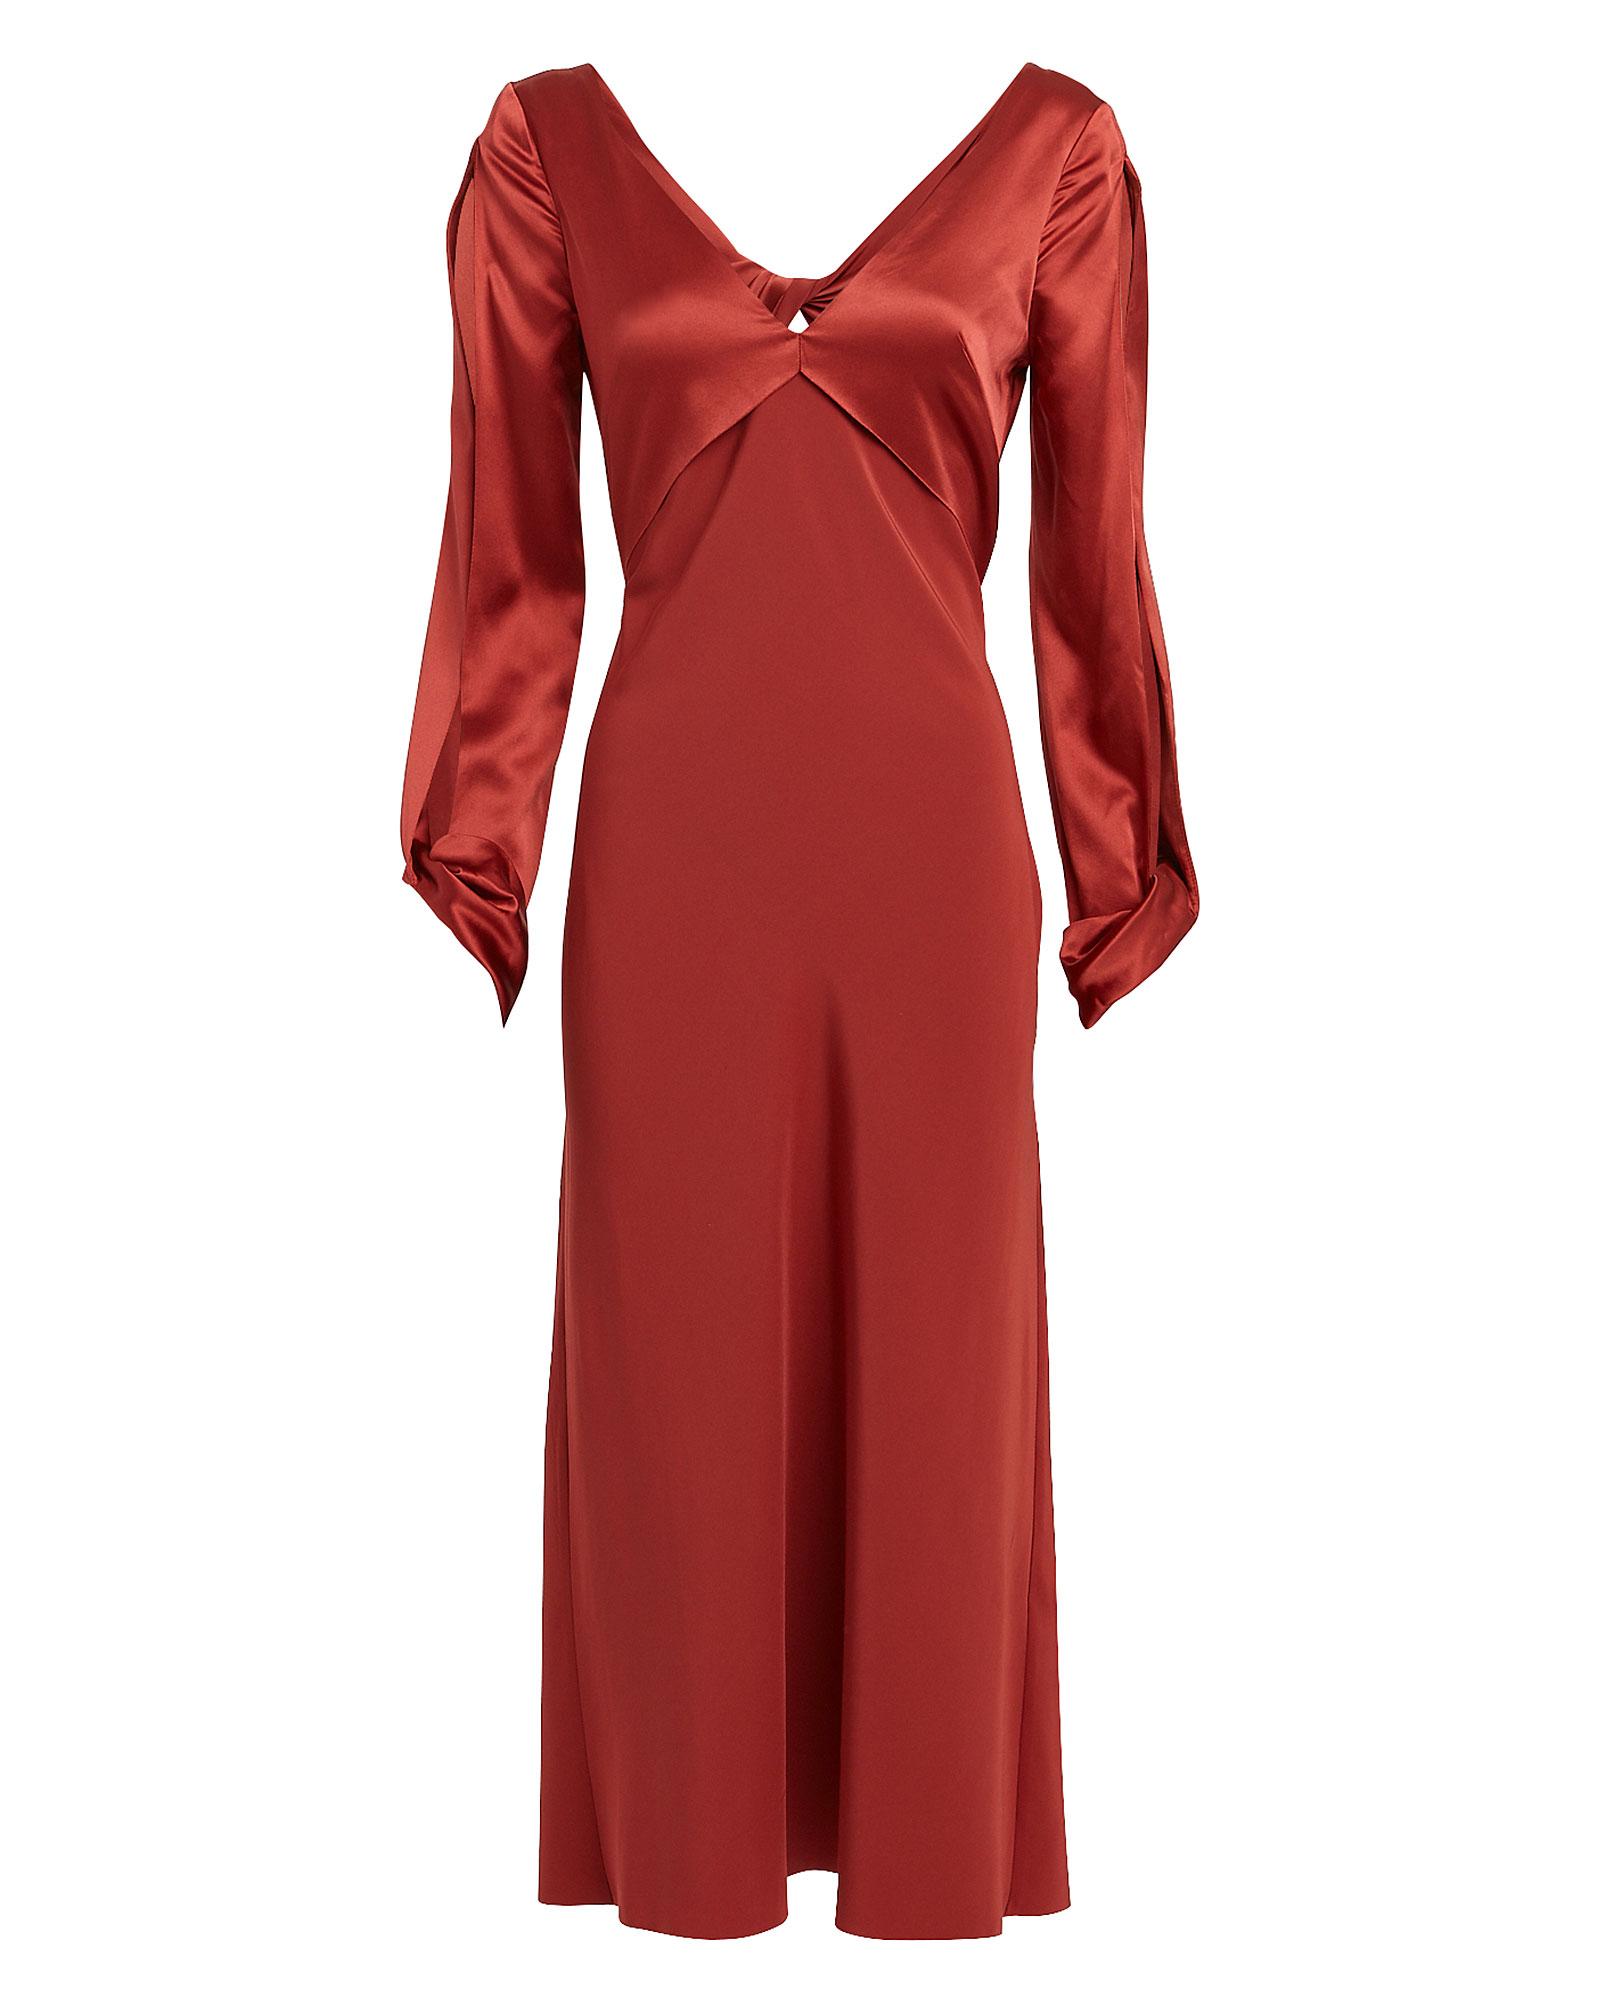 Dion Lee Dresses Twisted Silk Satin & Crepe Dress